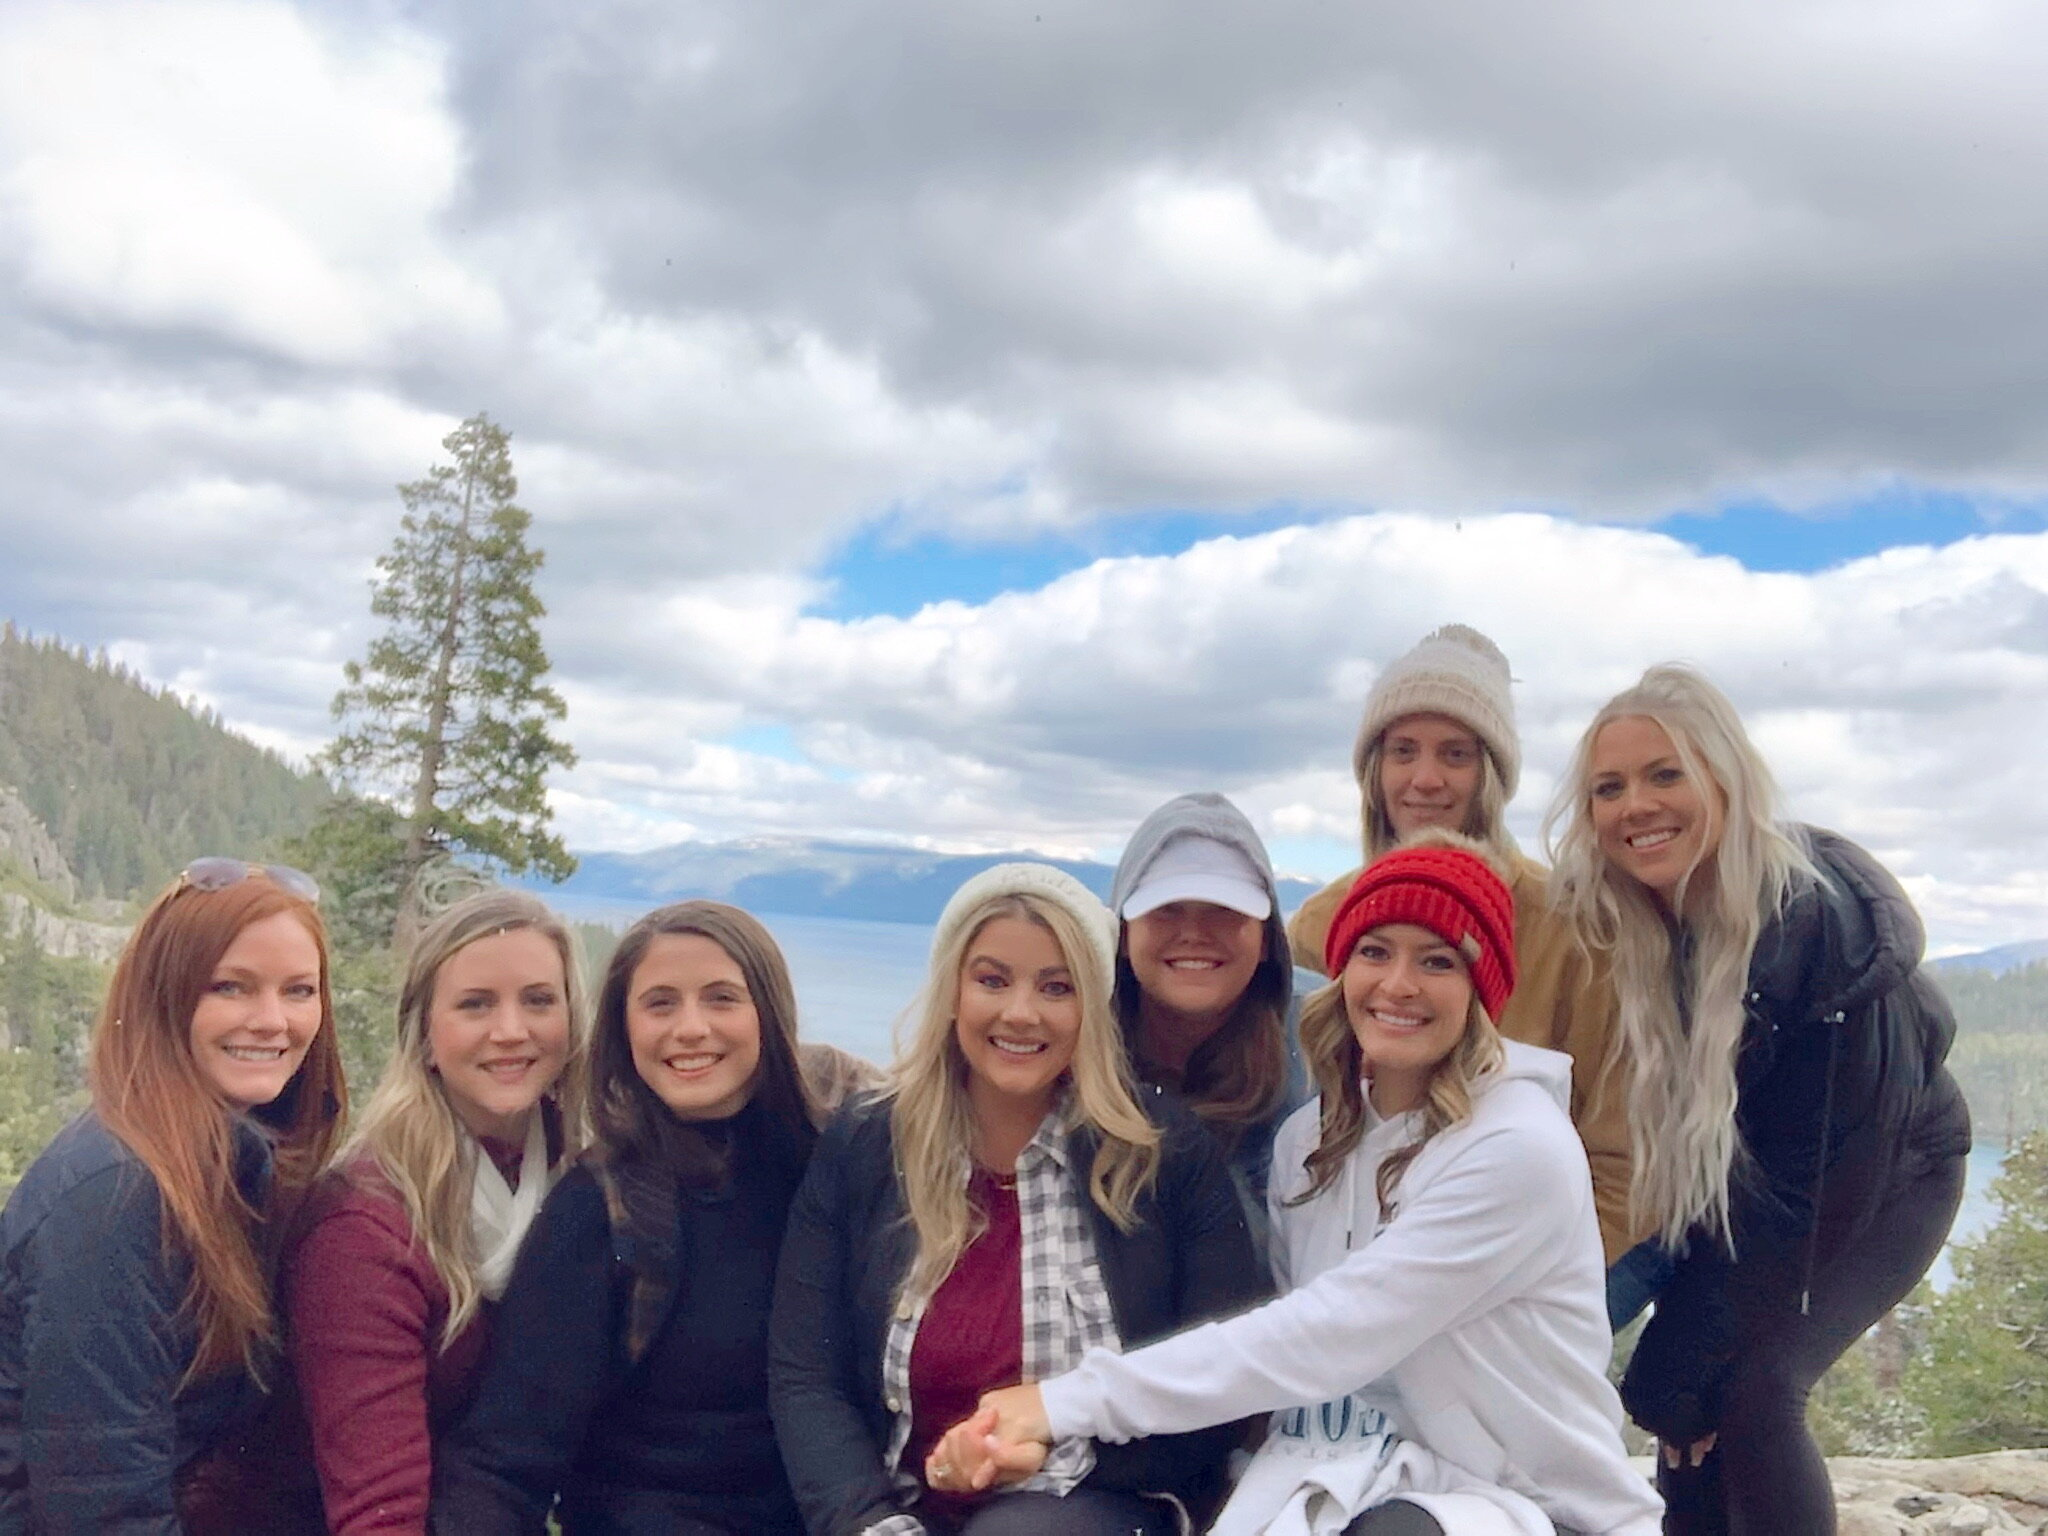 Fall Bachelorette Party Idea Mountain Getaway Plan Our